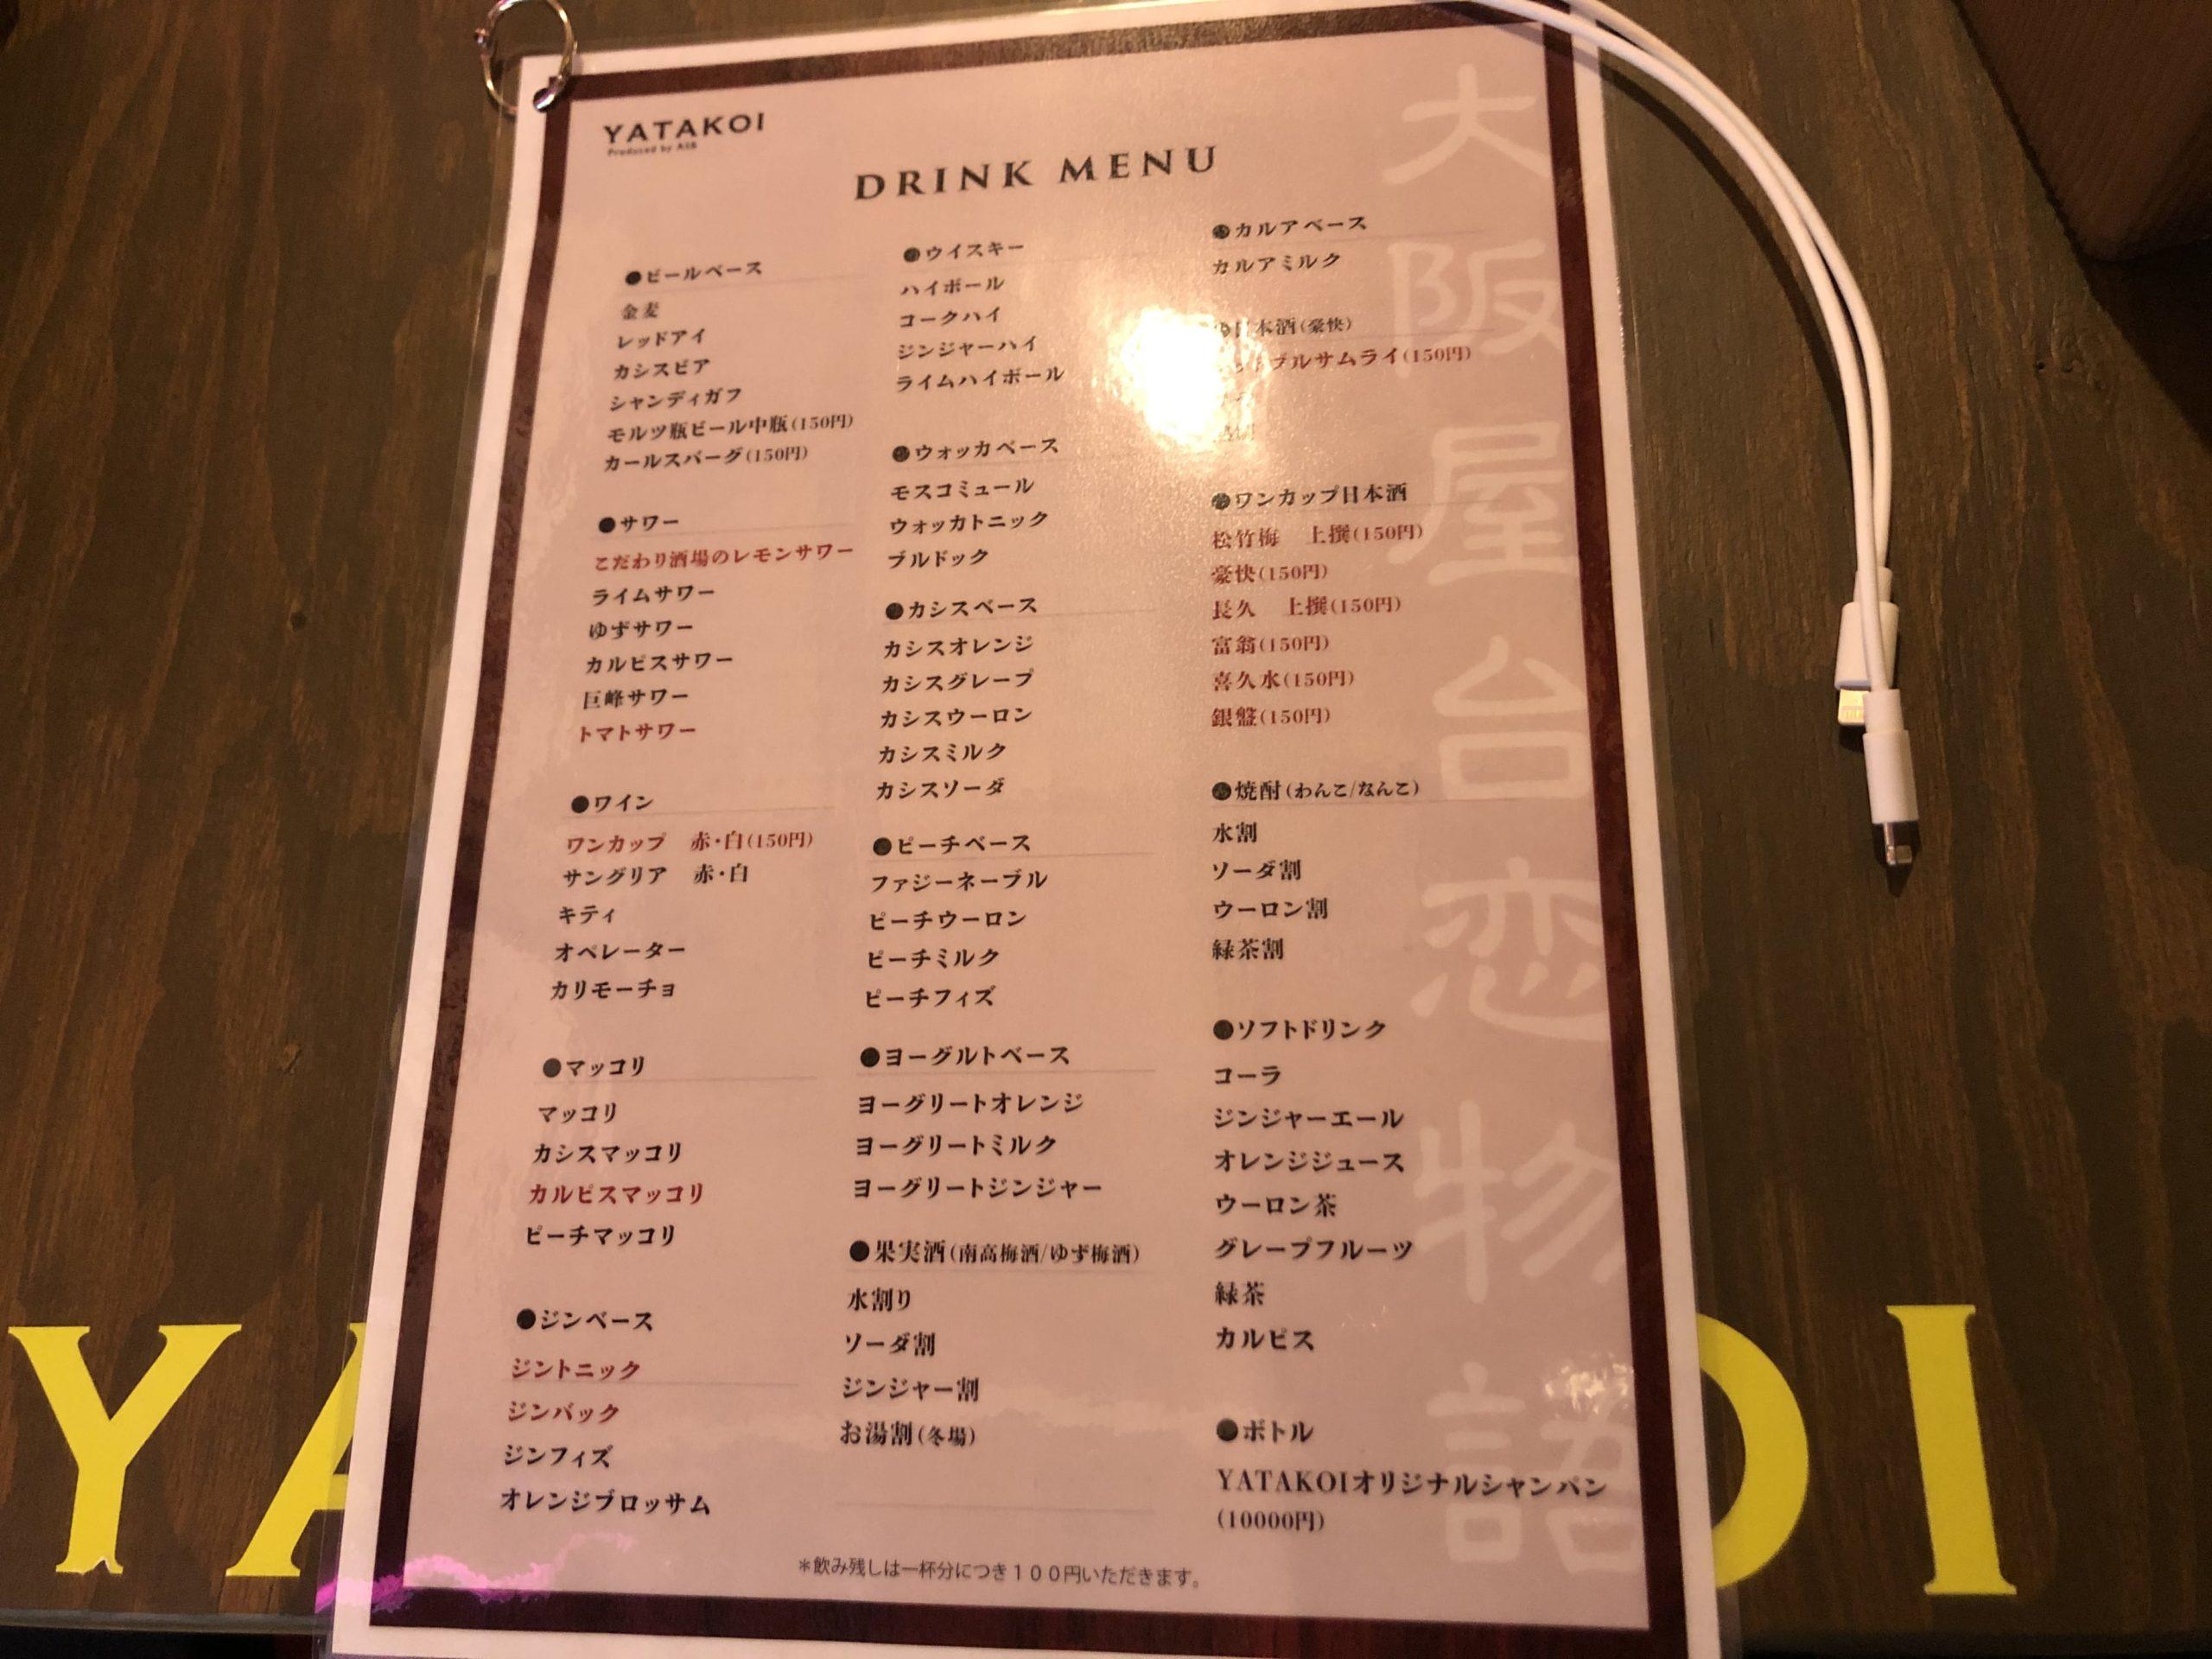 YATAKOI drink menu